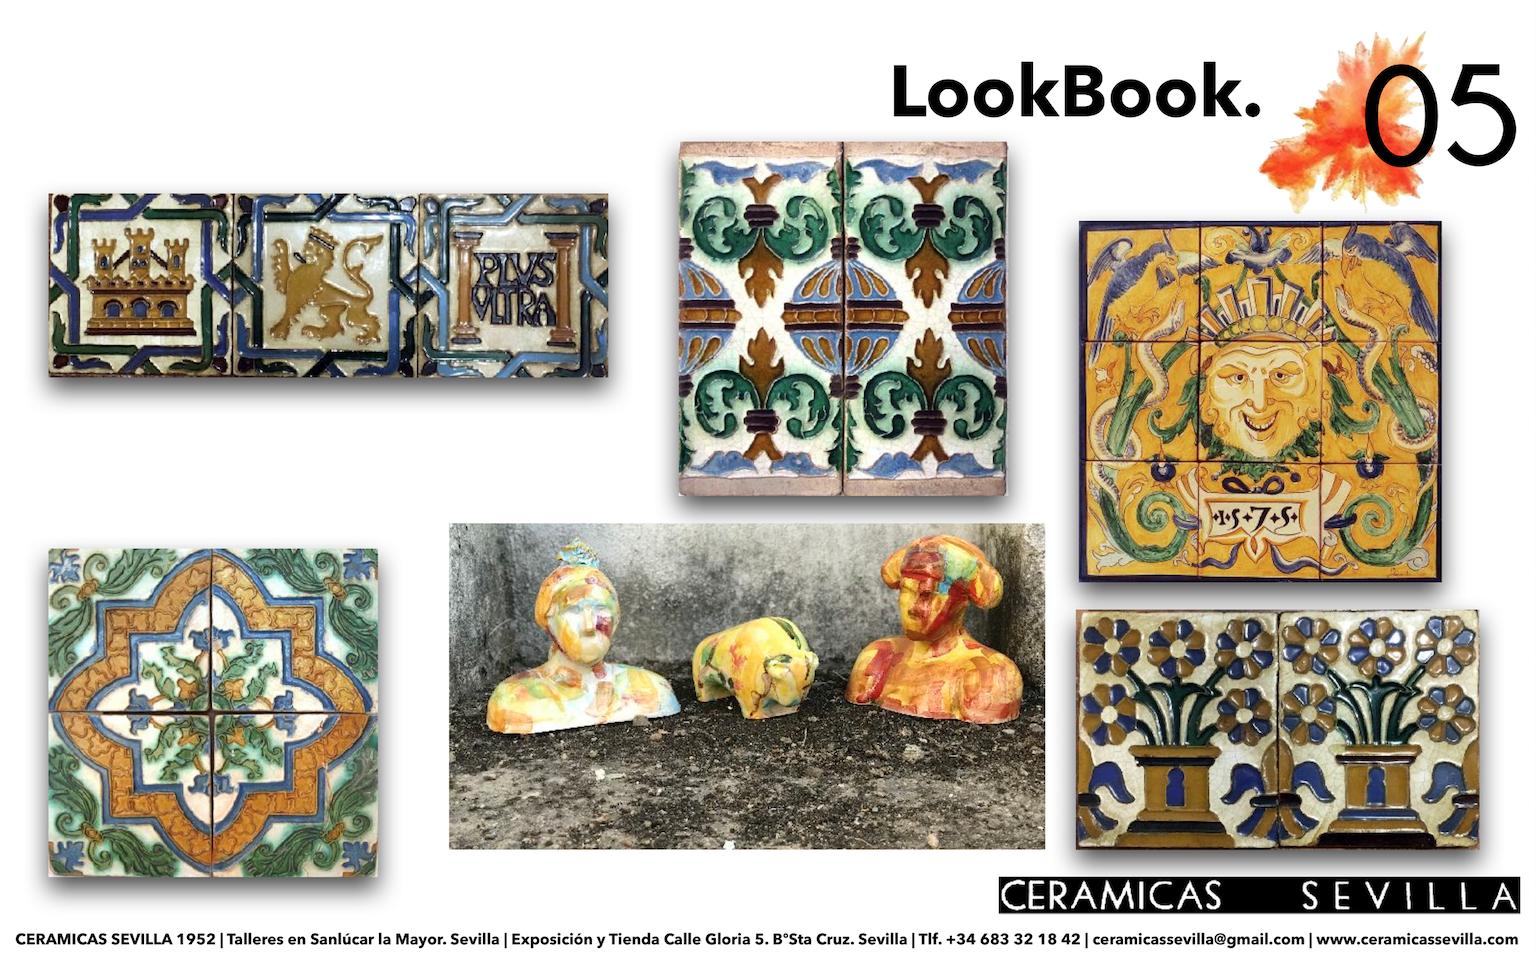 Portfolio Ceramicas Sevilla Pagina 9.png